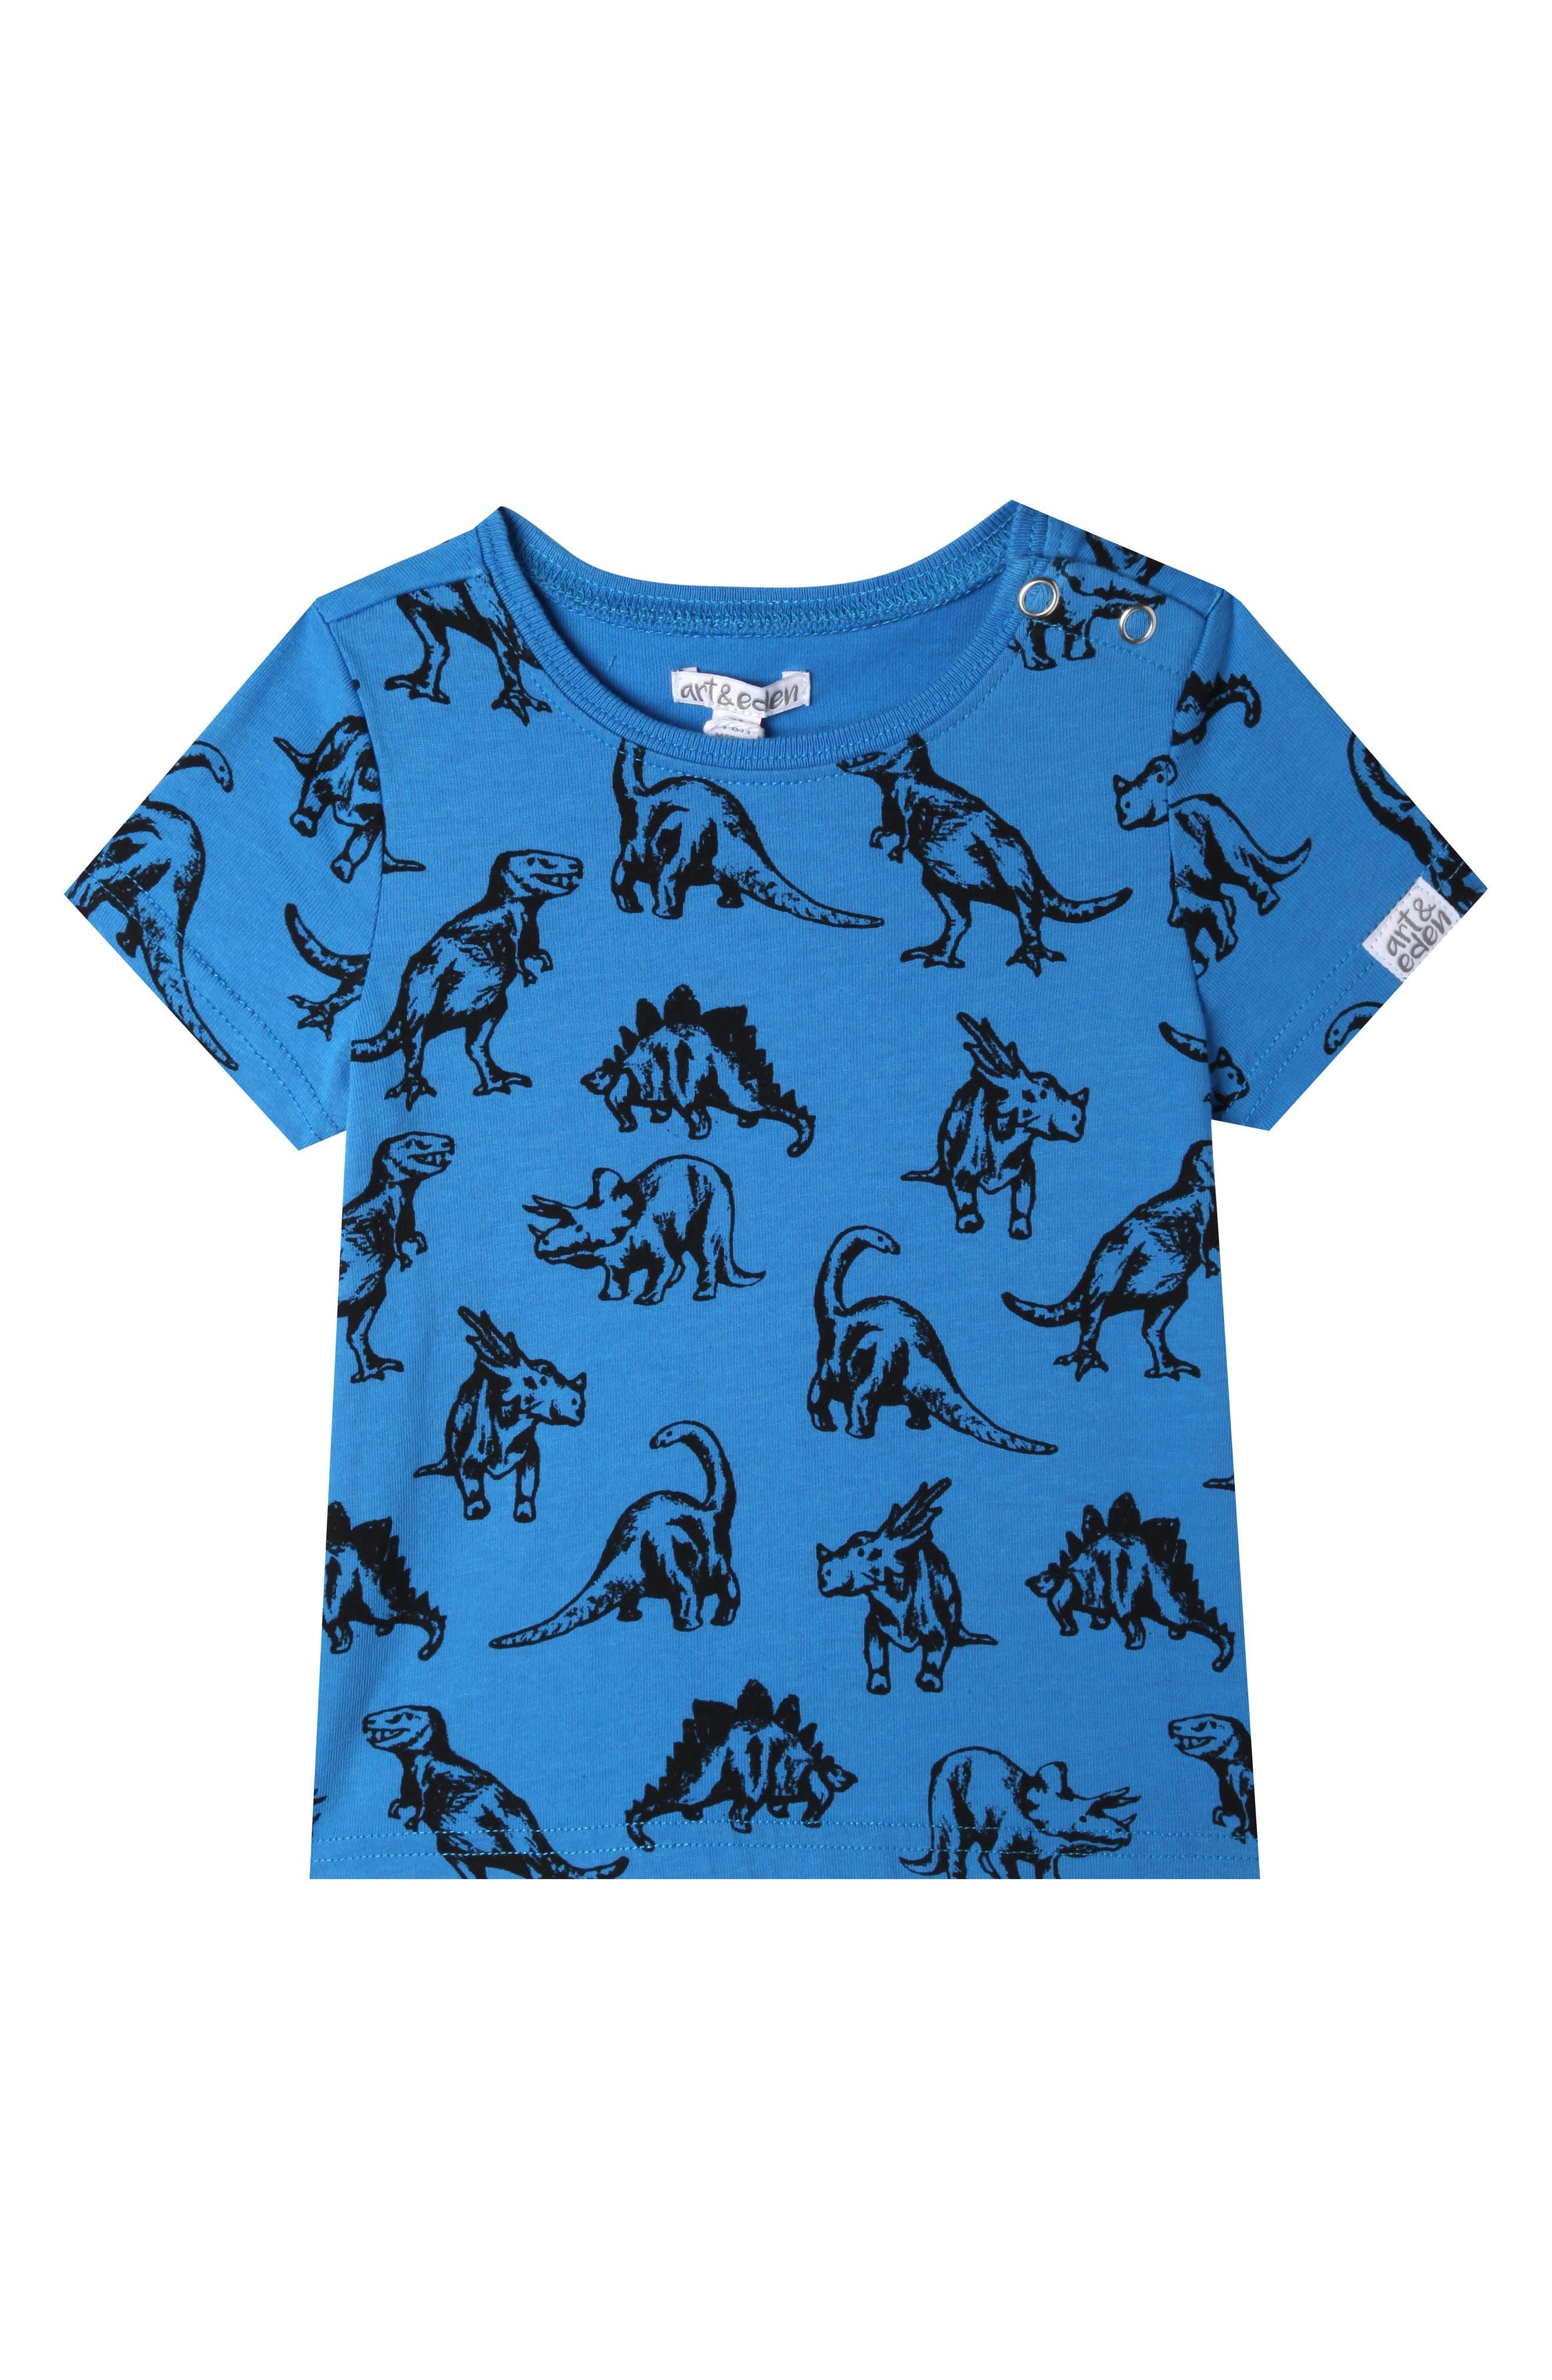 Hunter T-Shirt,                             Main thumbnail 1, color,                             French Blue